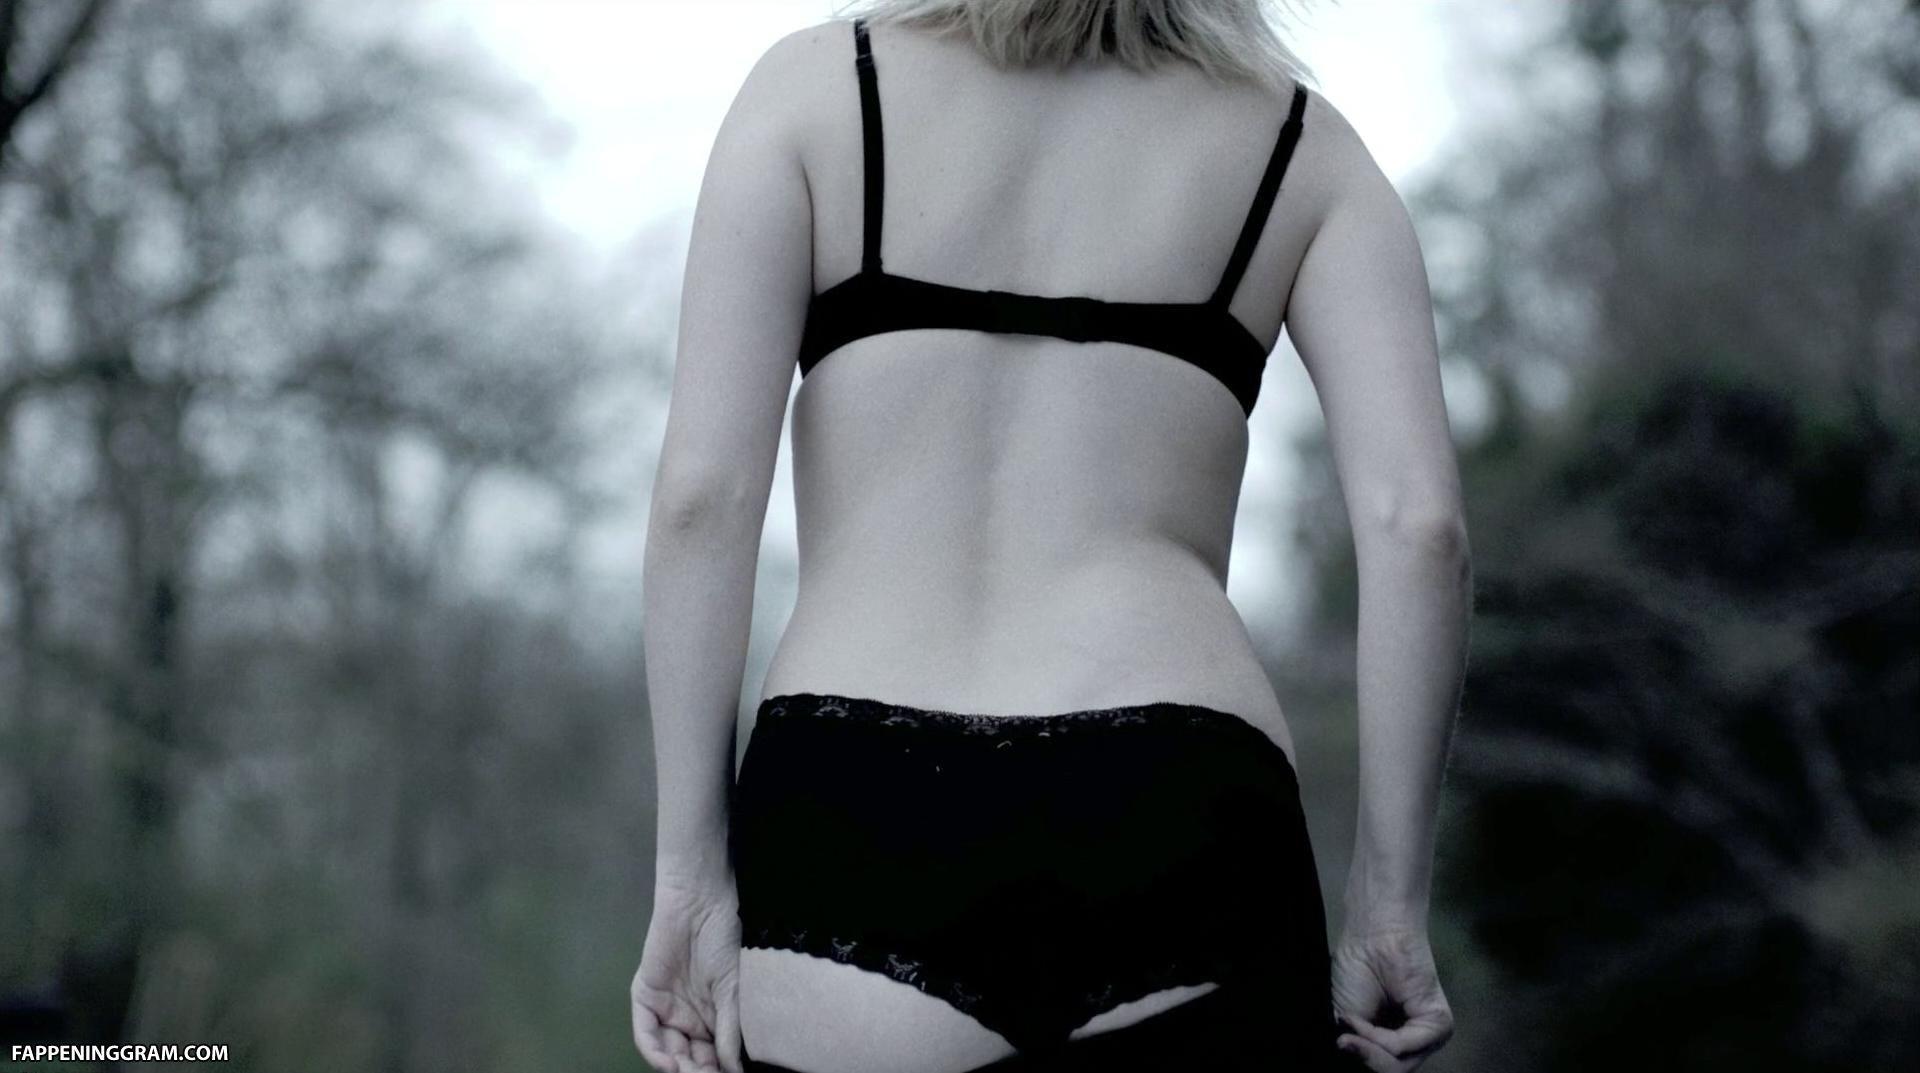 Ashley Harris Porn ashley blankenship nude the fappening - fappeninggram